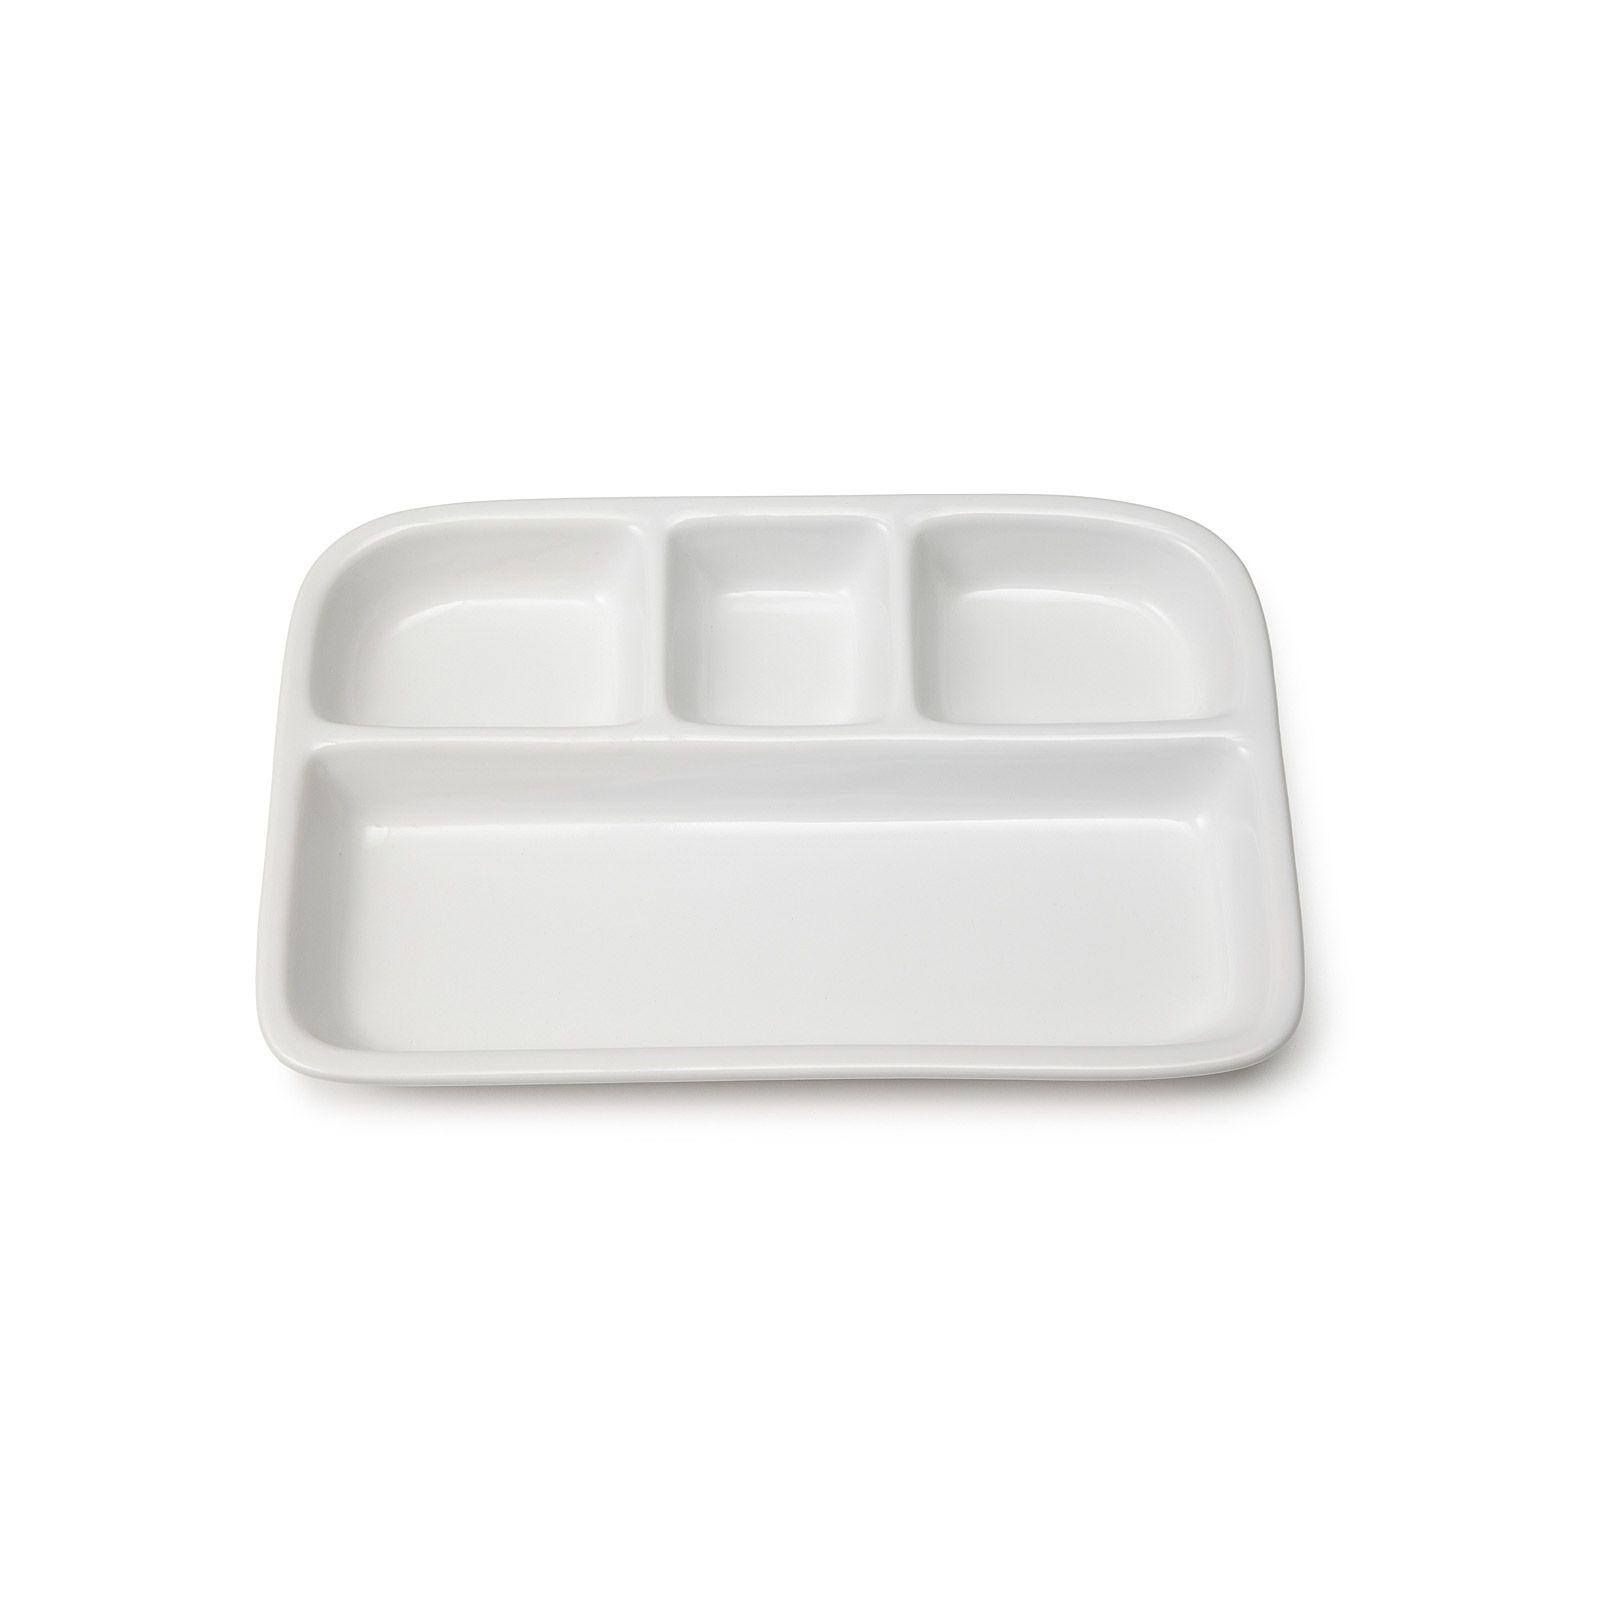 Stoneware Tv Dinner Trays Ceramic Plate Uncommongoods